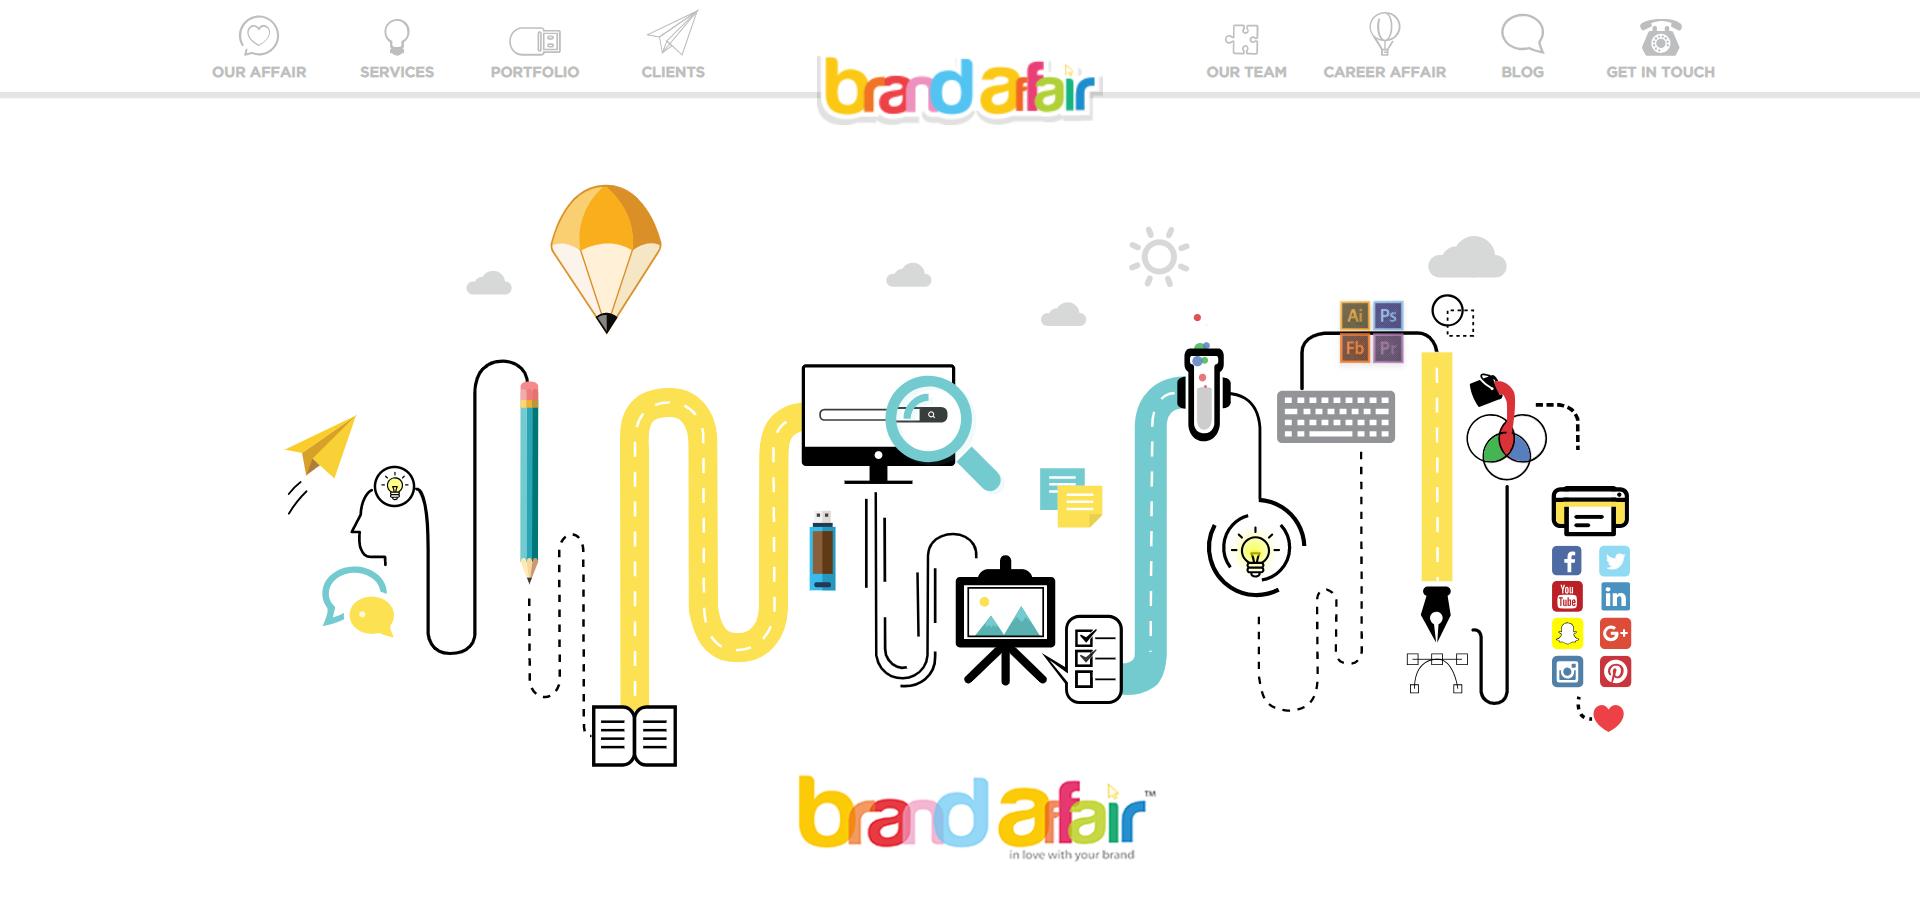 Kreative-Kode-brandaffair